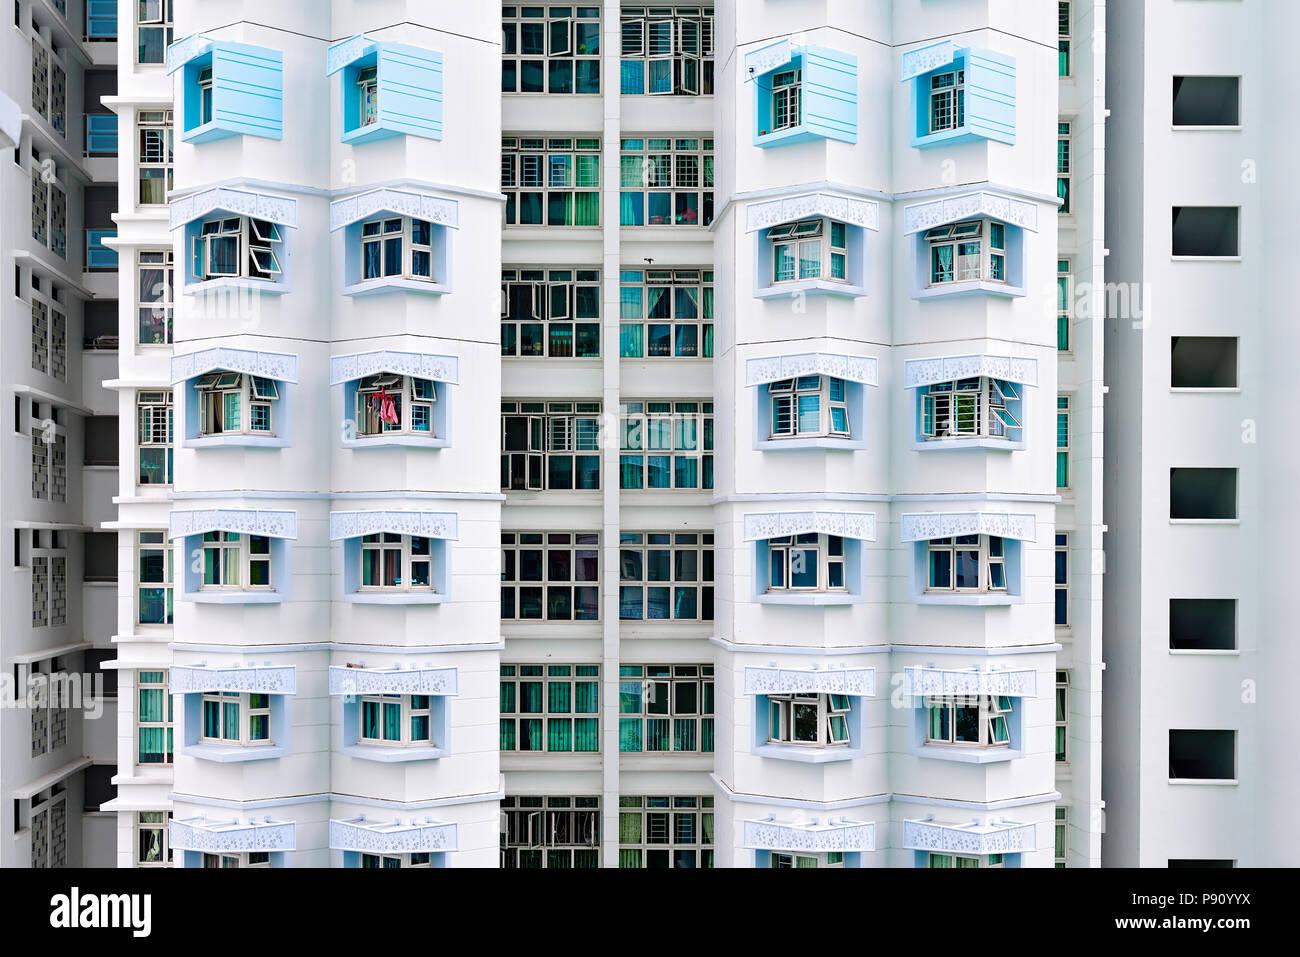 Singapore. Facade of HDB public housing. - Stock Image